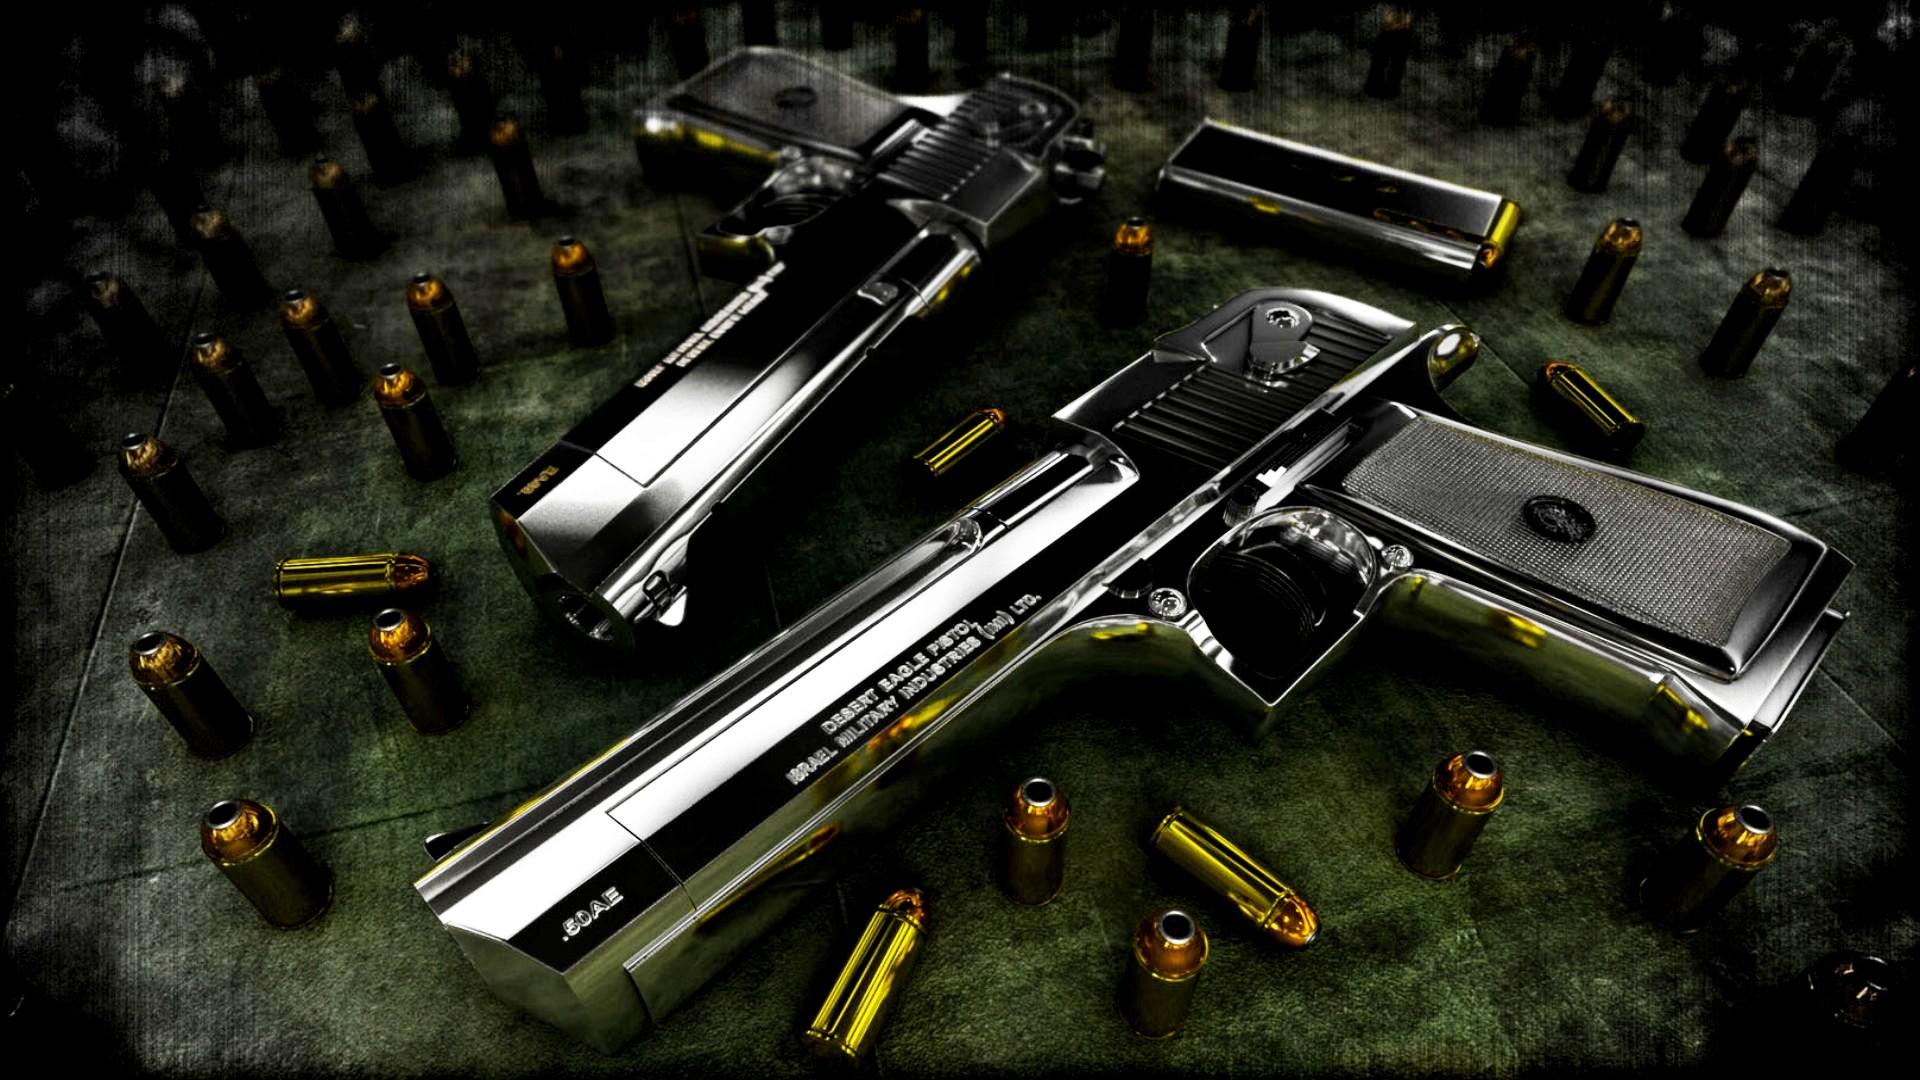 1920x1080 Beautiful Guns Wallpaper